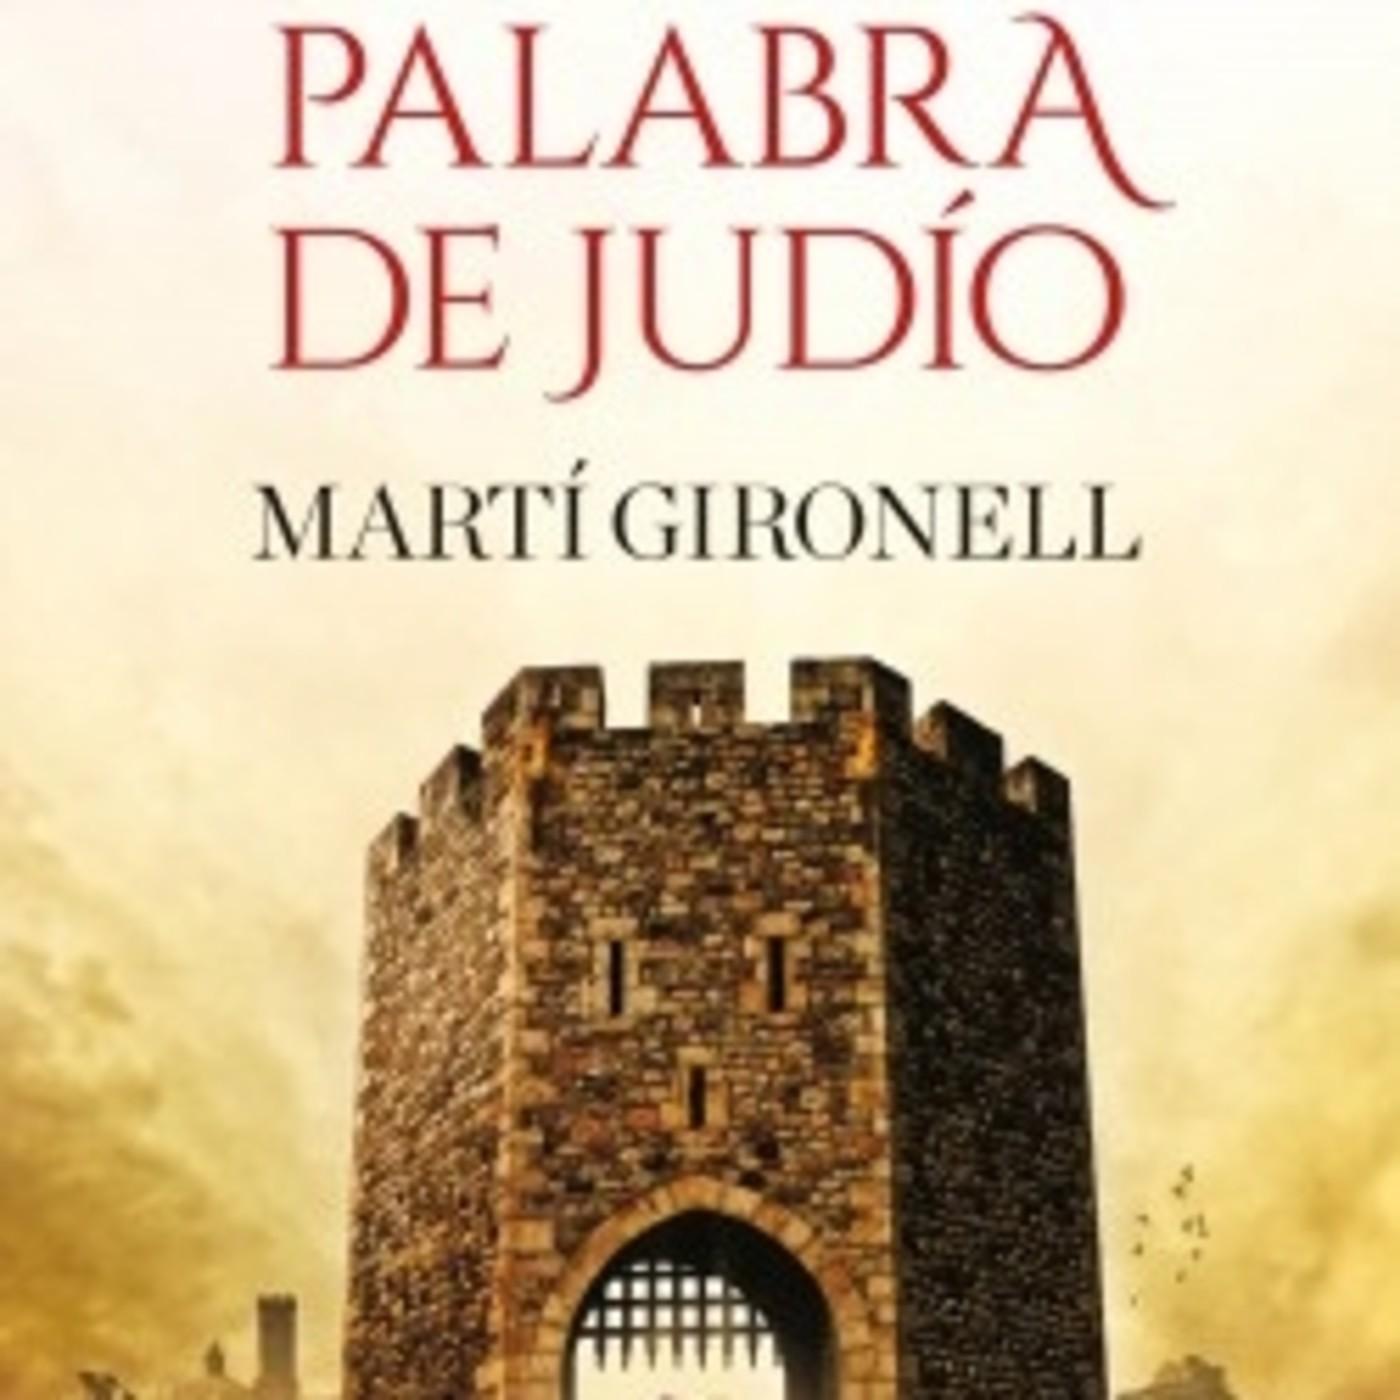 'Palabra de judío' de Martí Gironell